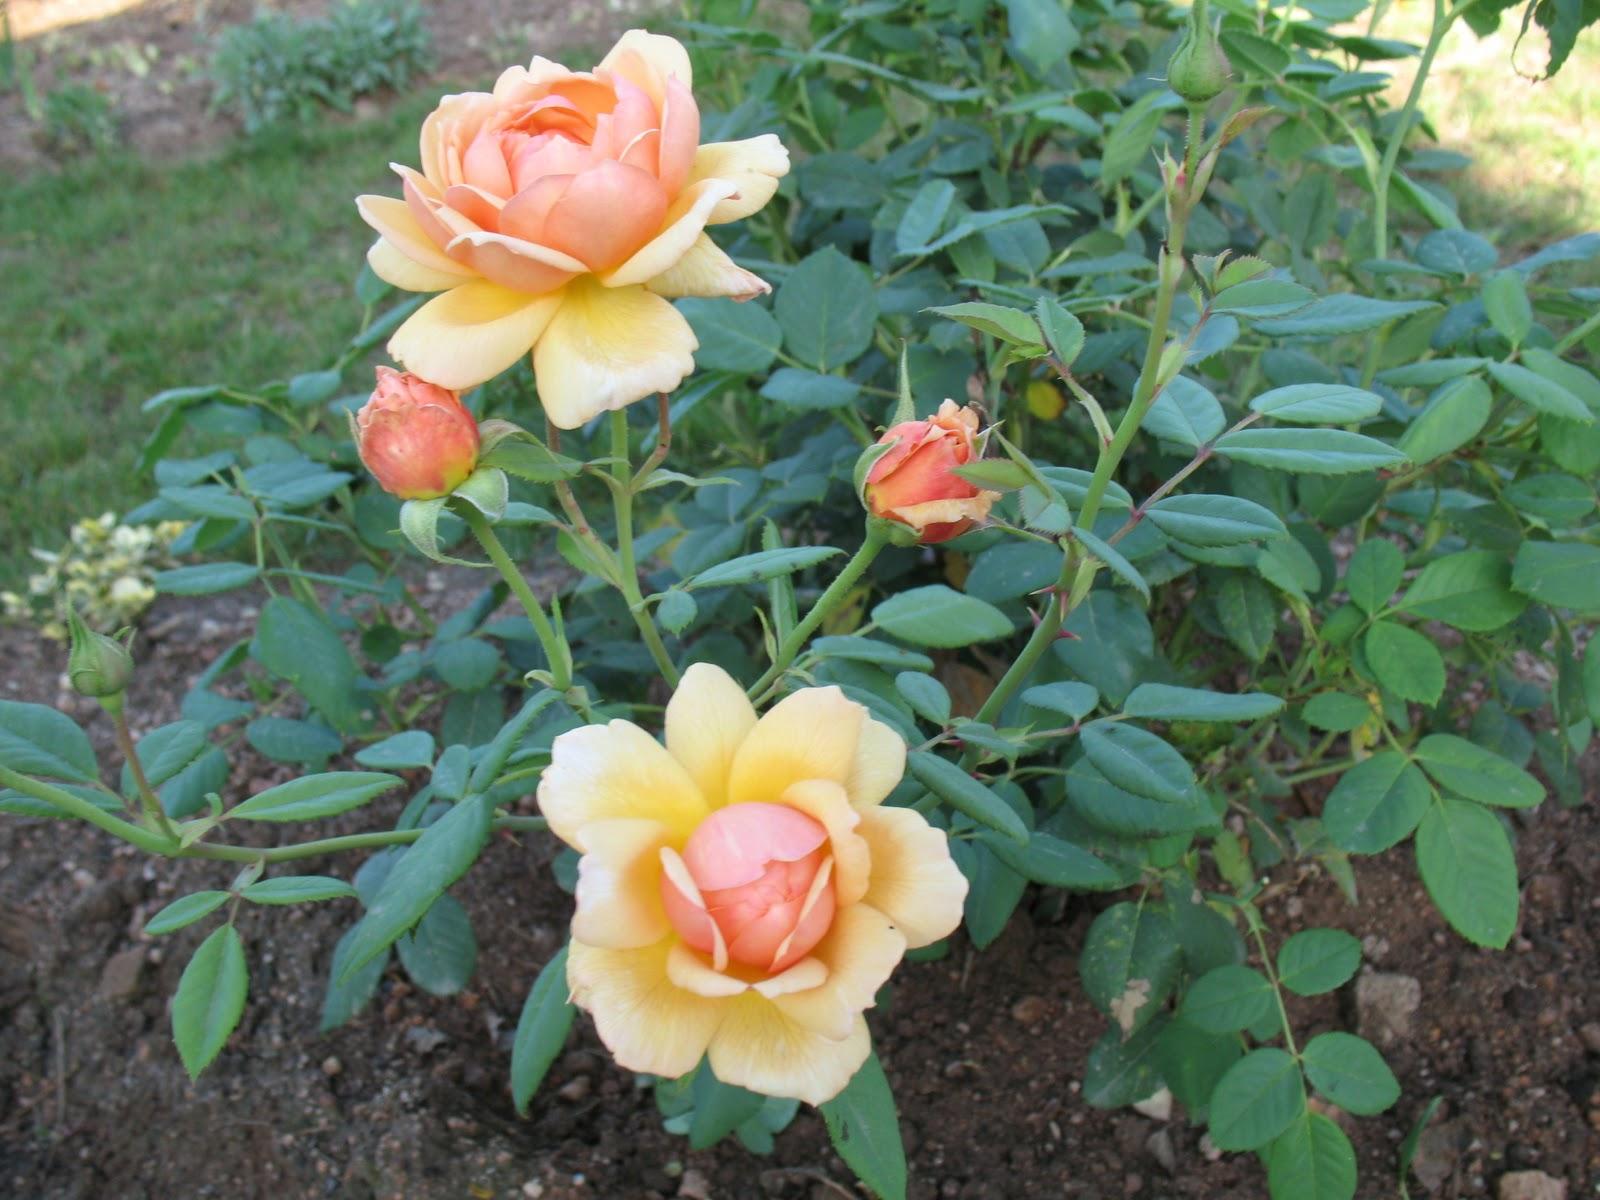 Roses du jardin ch neland rosier grace for Decoration jardin rosier